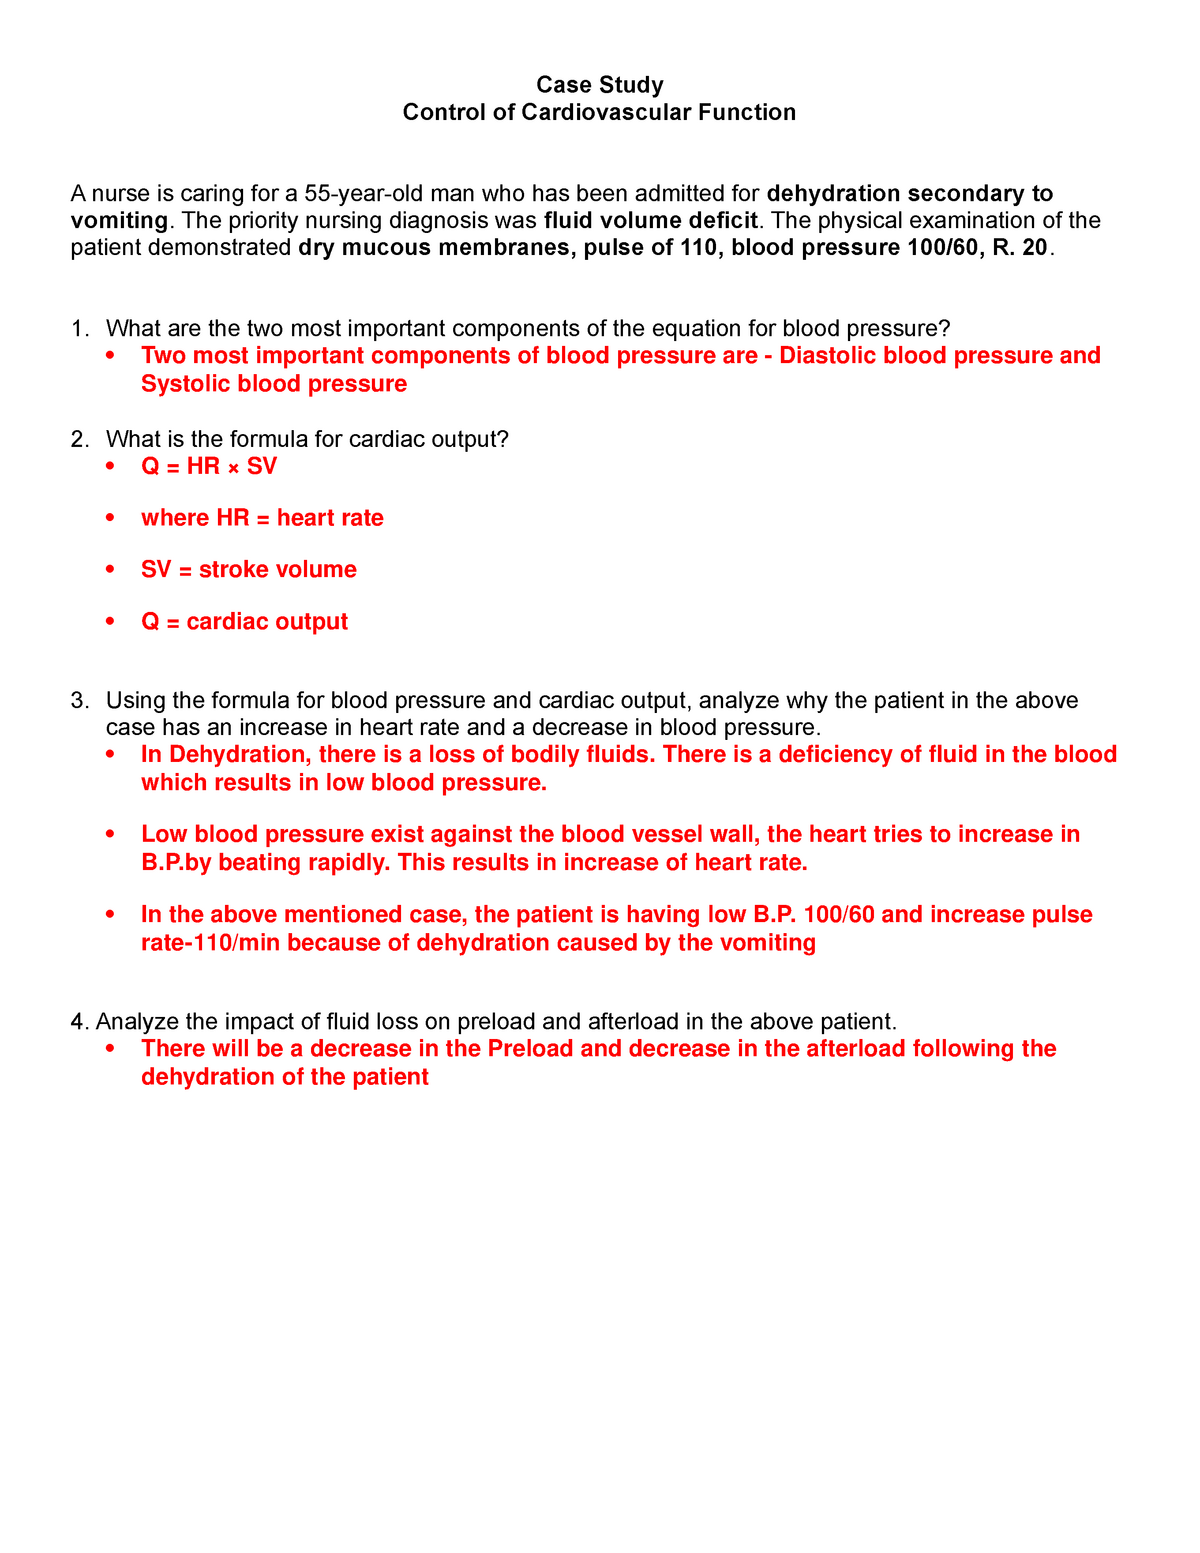 Control Of Cardiac Function Case Study Biol 2214 Brcc Studocu